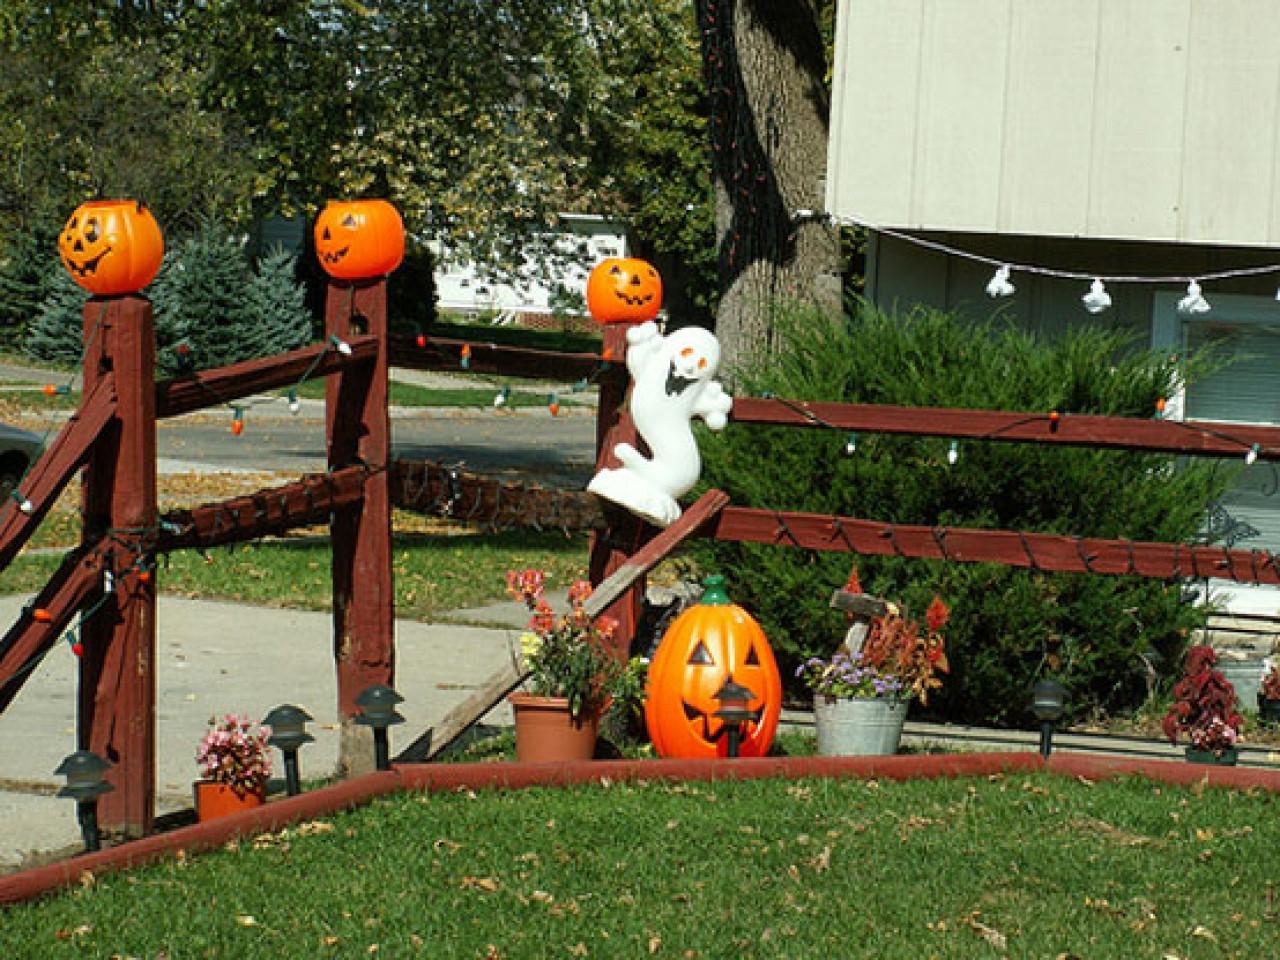 Halloween Decor Outdoor  Outside halloween decorations ideas best outdoor